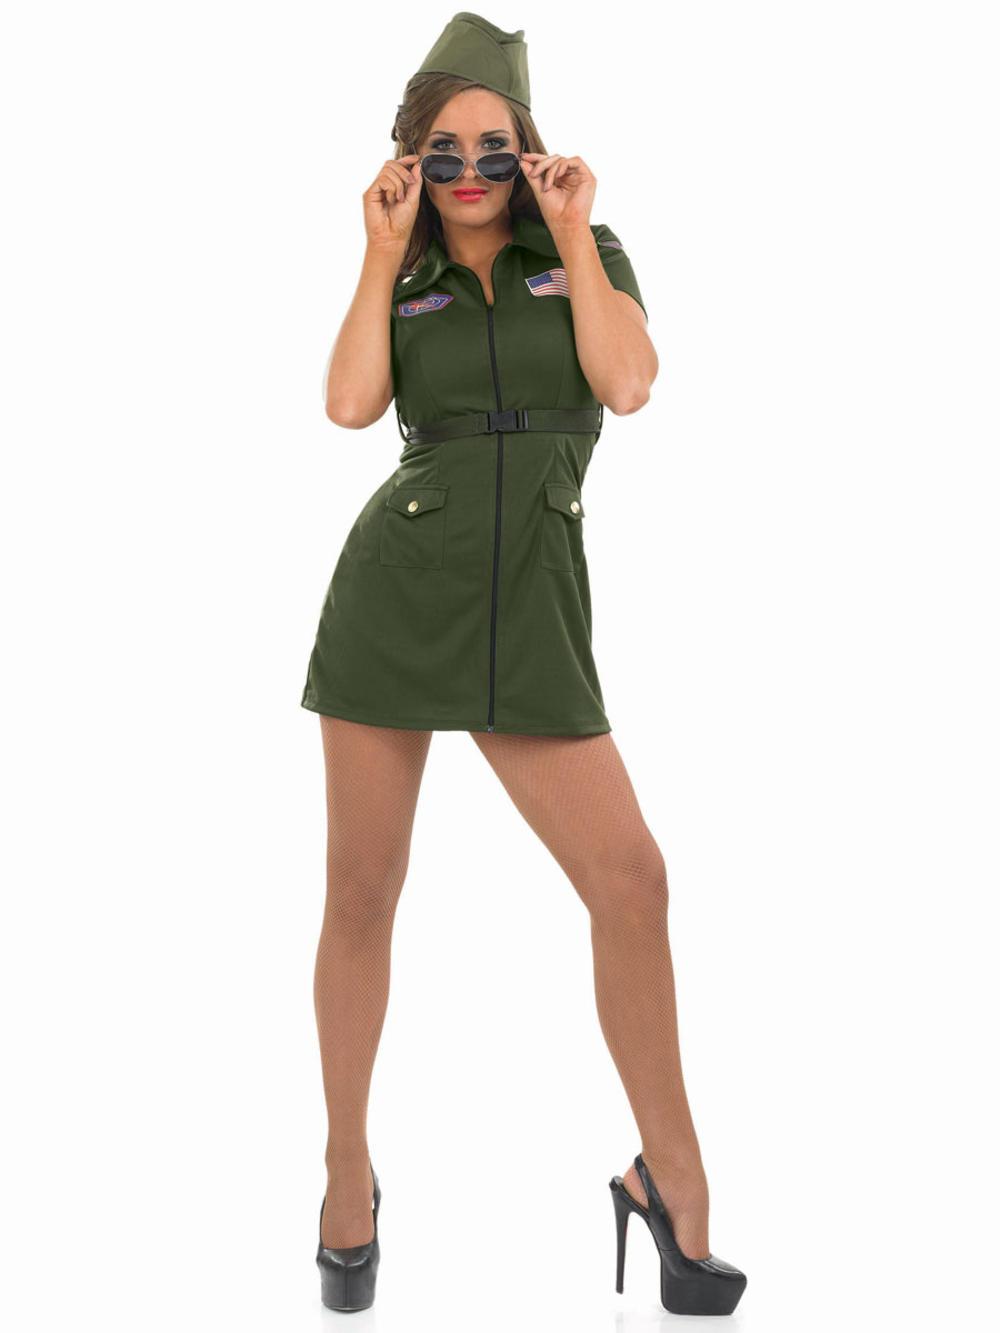 Pilot Girl Costume + Hat 80s Air Force Uniform Womens Military Fancy Dress New